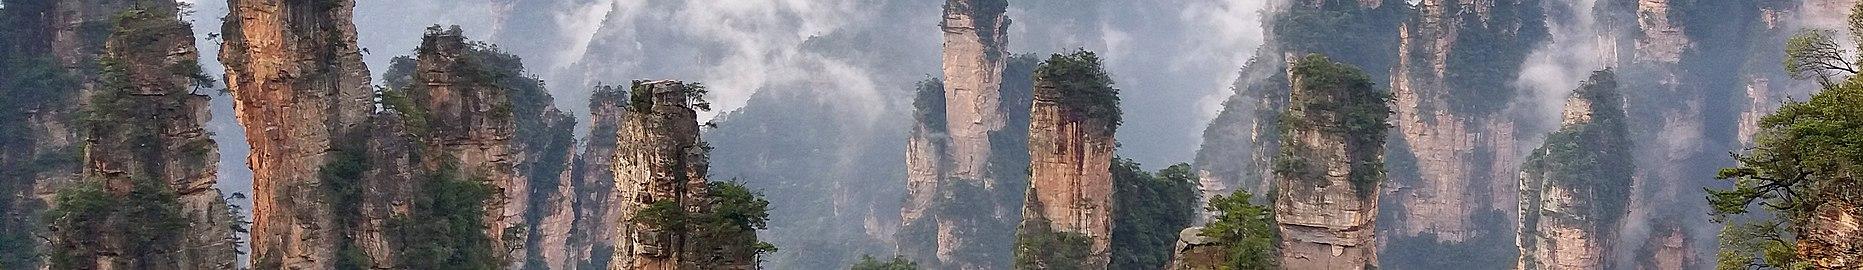 Zhangjiajie banner.jpg